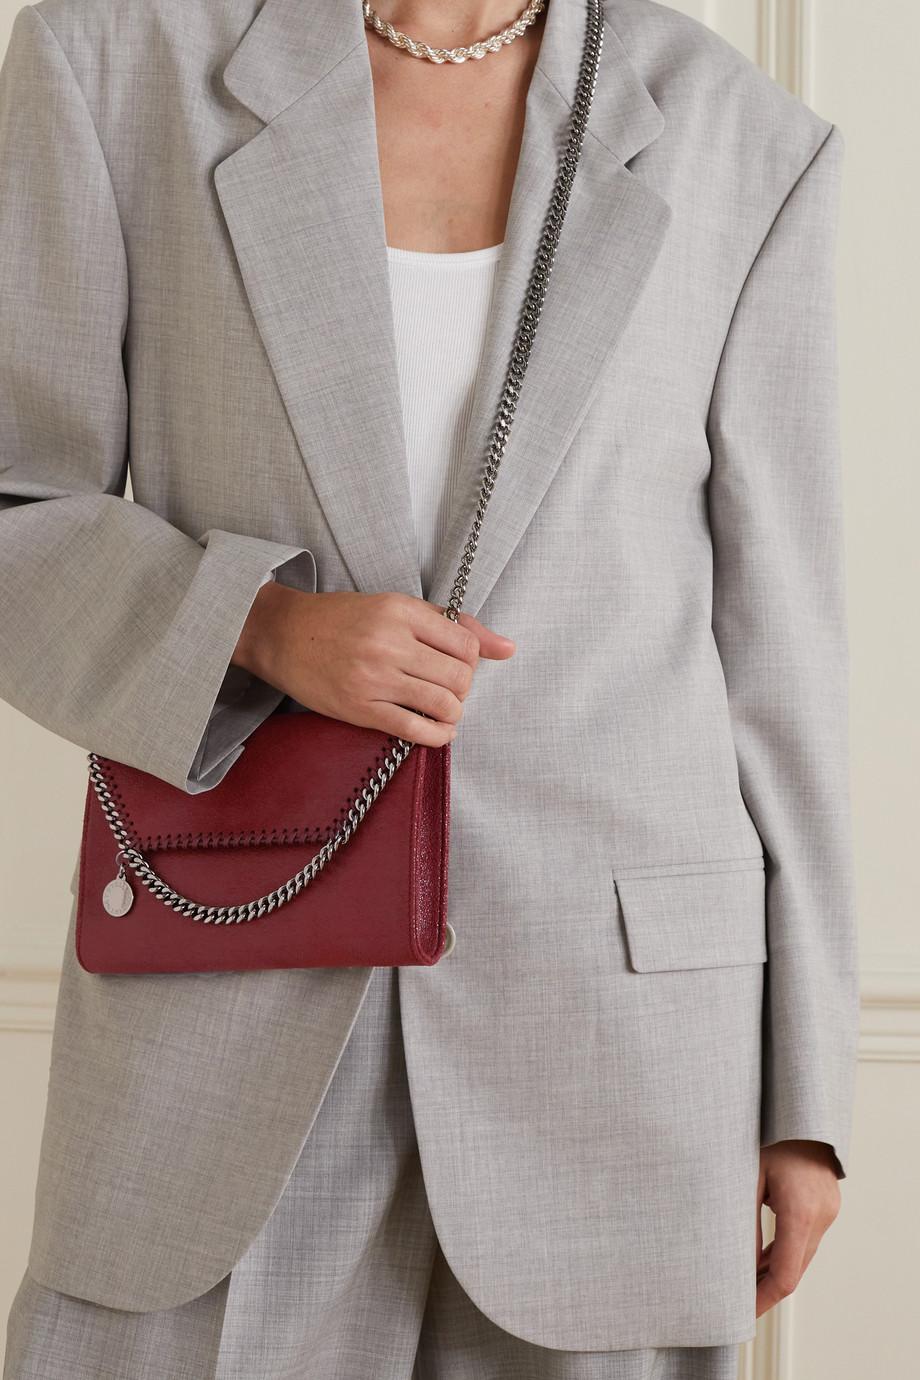 Stella McCartney The Falabella mini vegetarian textured-leather shoulder bag